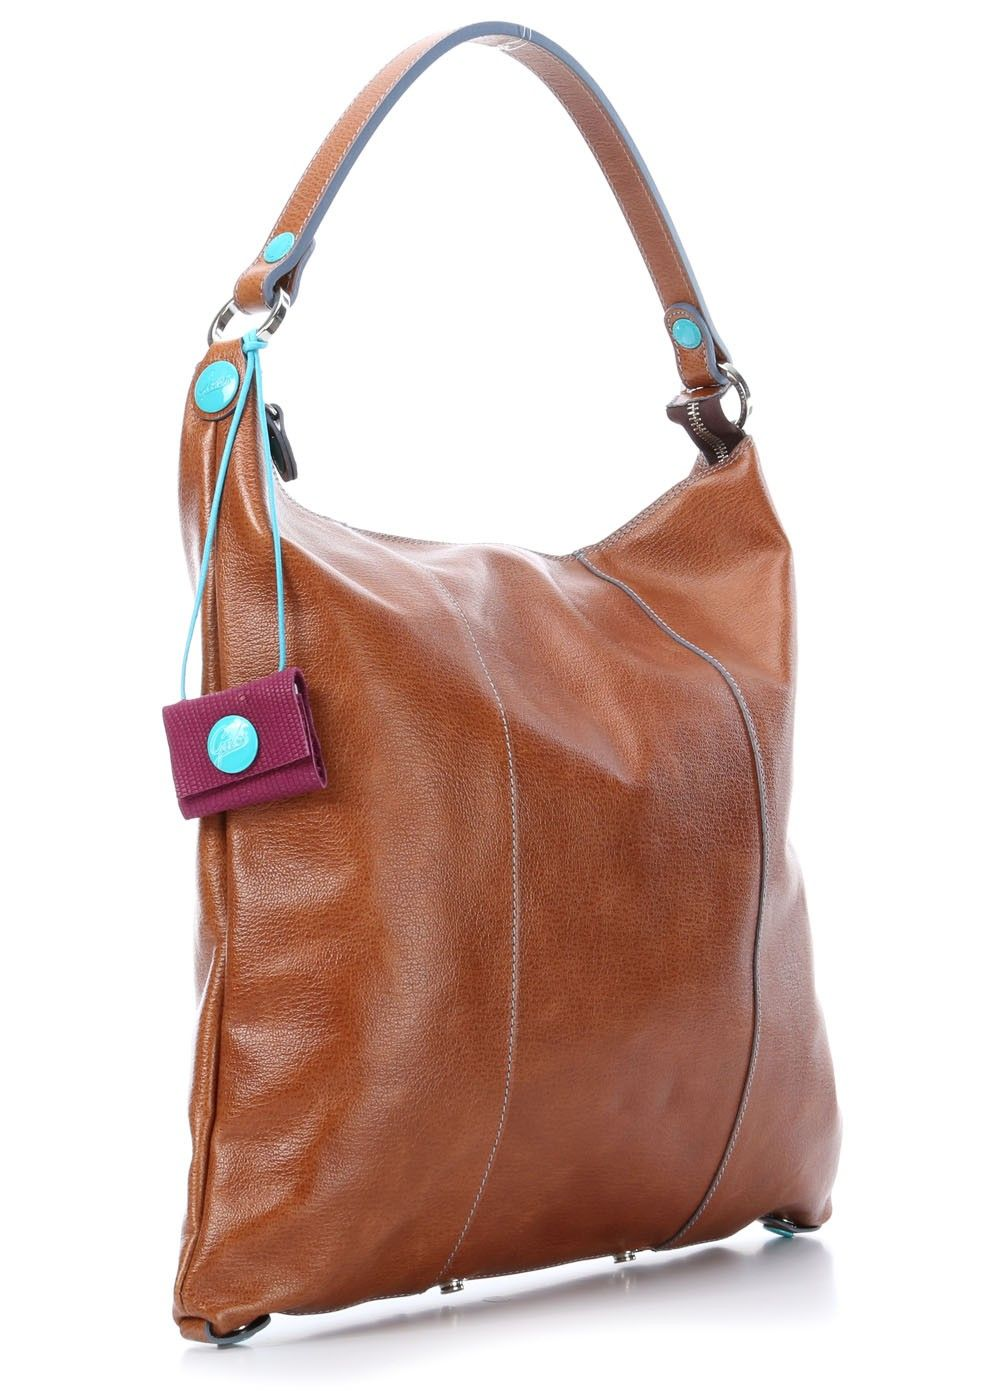 Gabs bags handbags and purses designer bags shop for Designer tische outlet